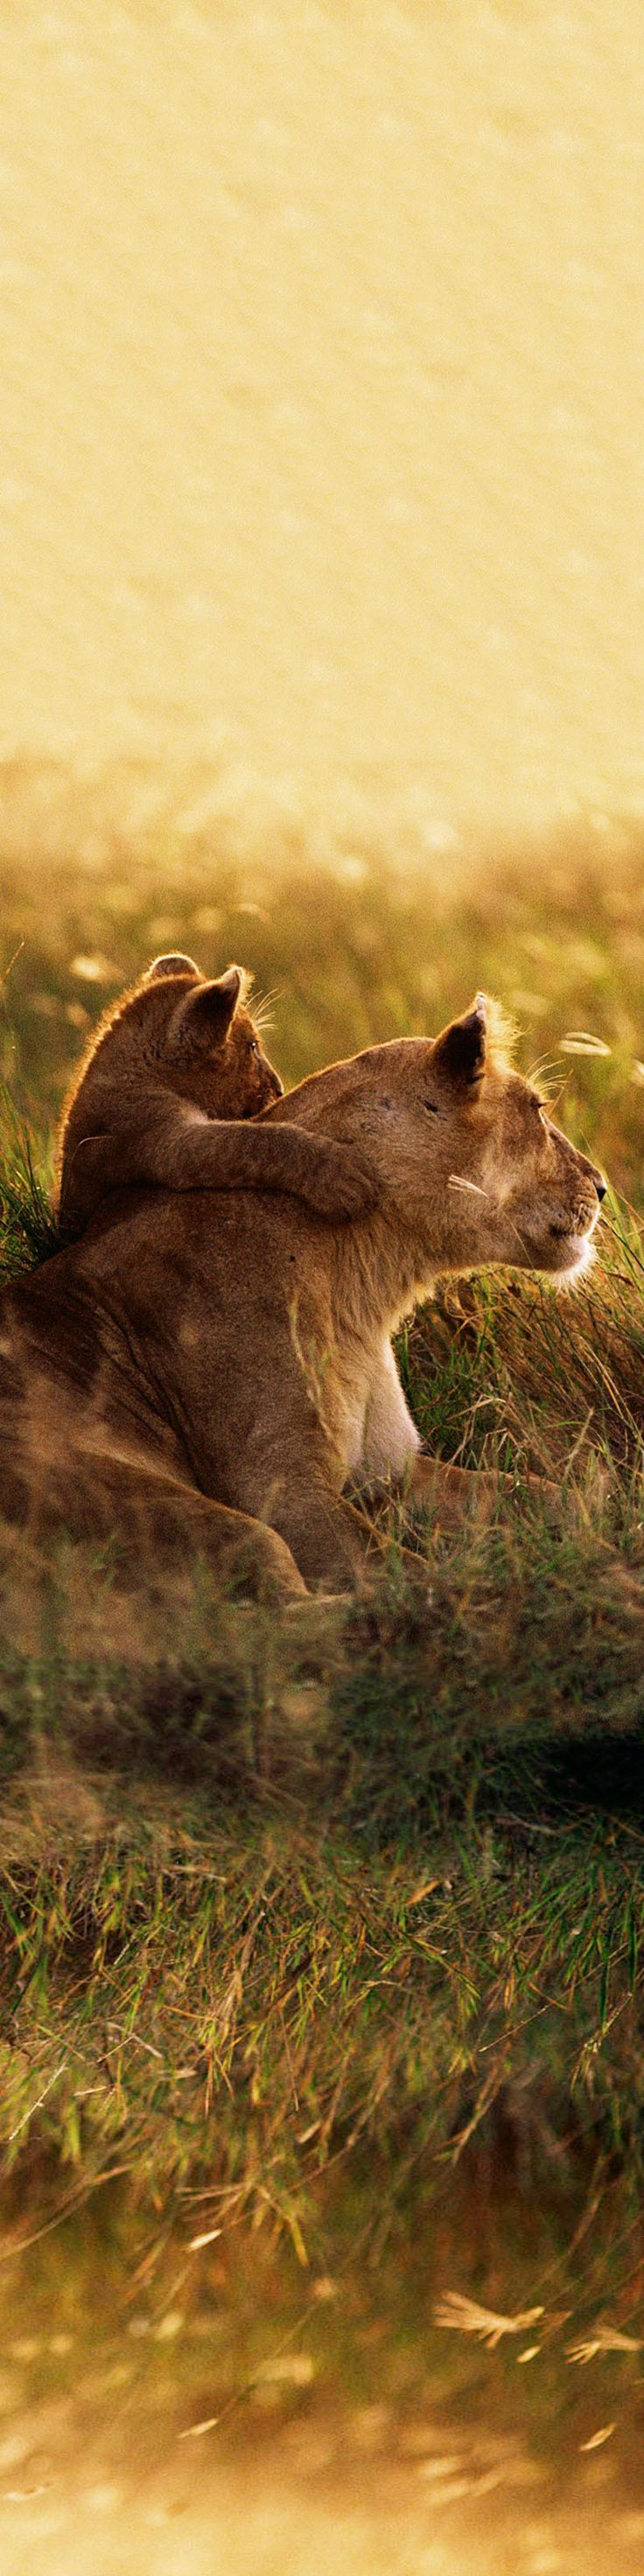 Best 25 Baby lions ideas on Pinterest  What is a lion Lion cub